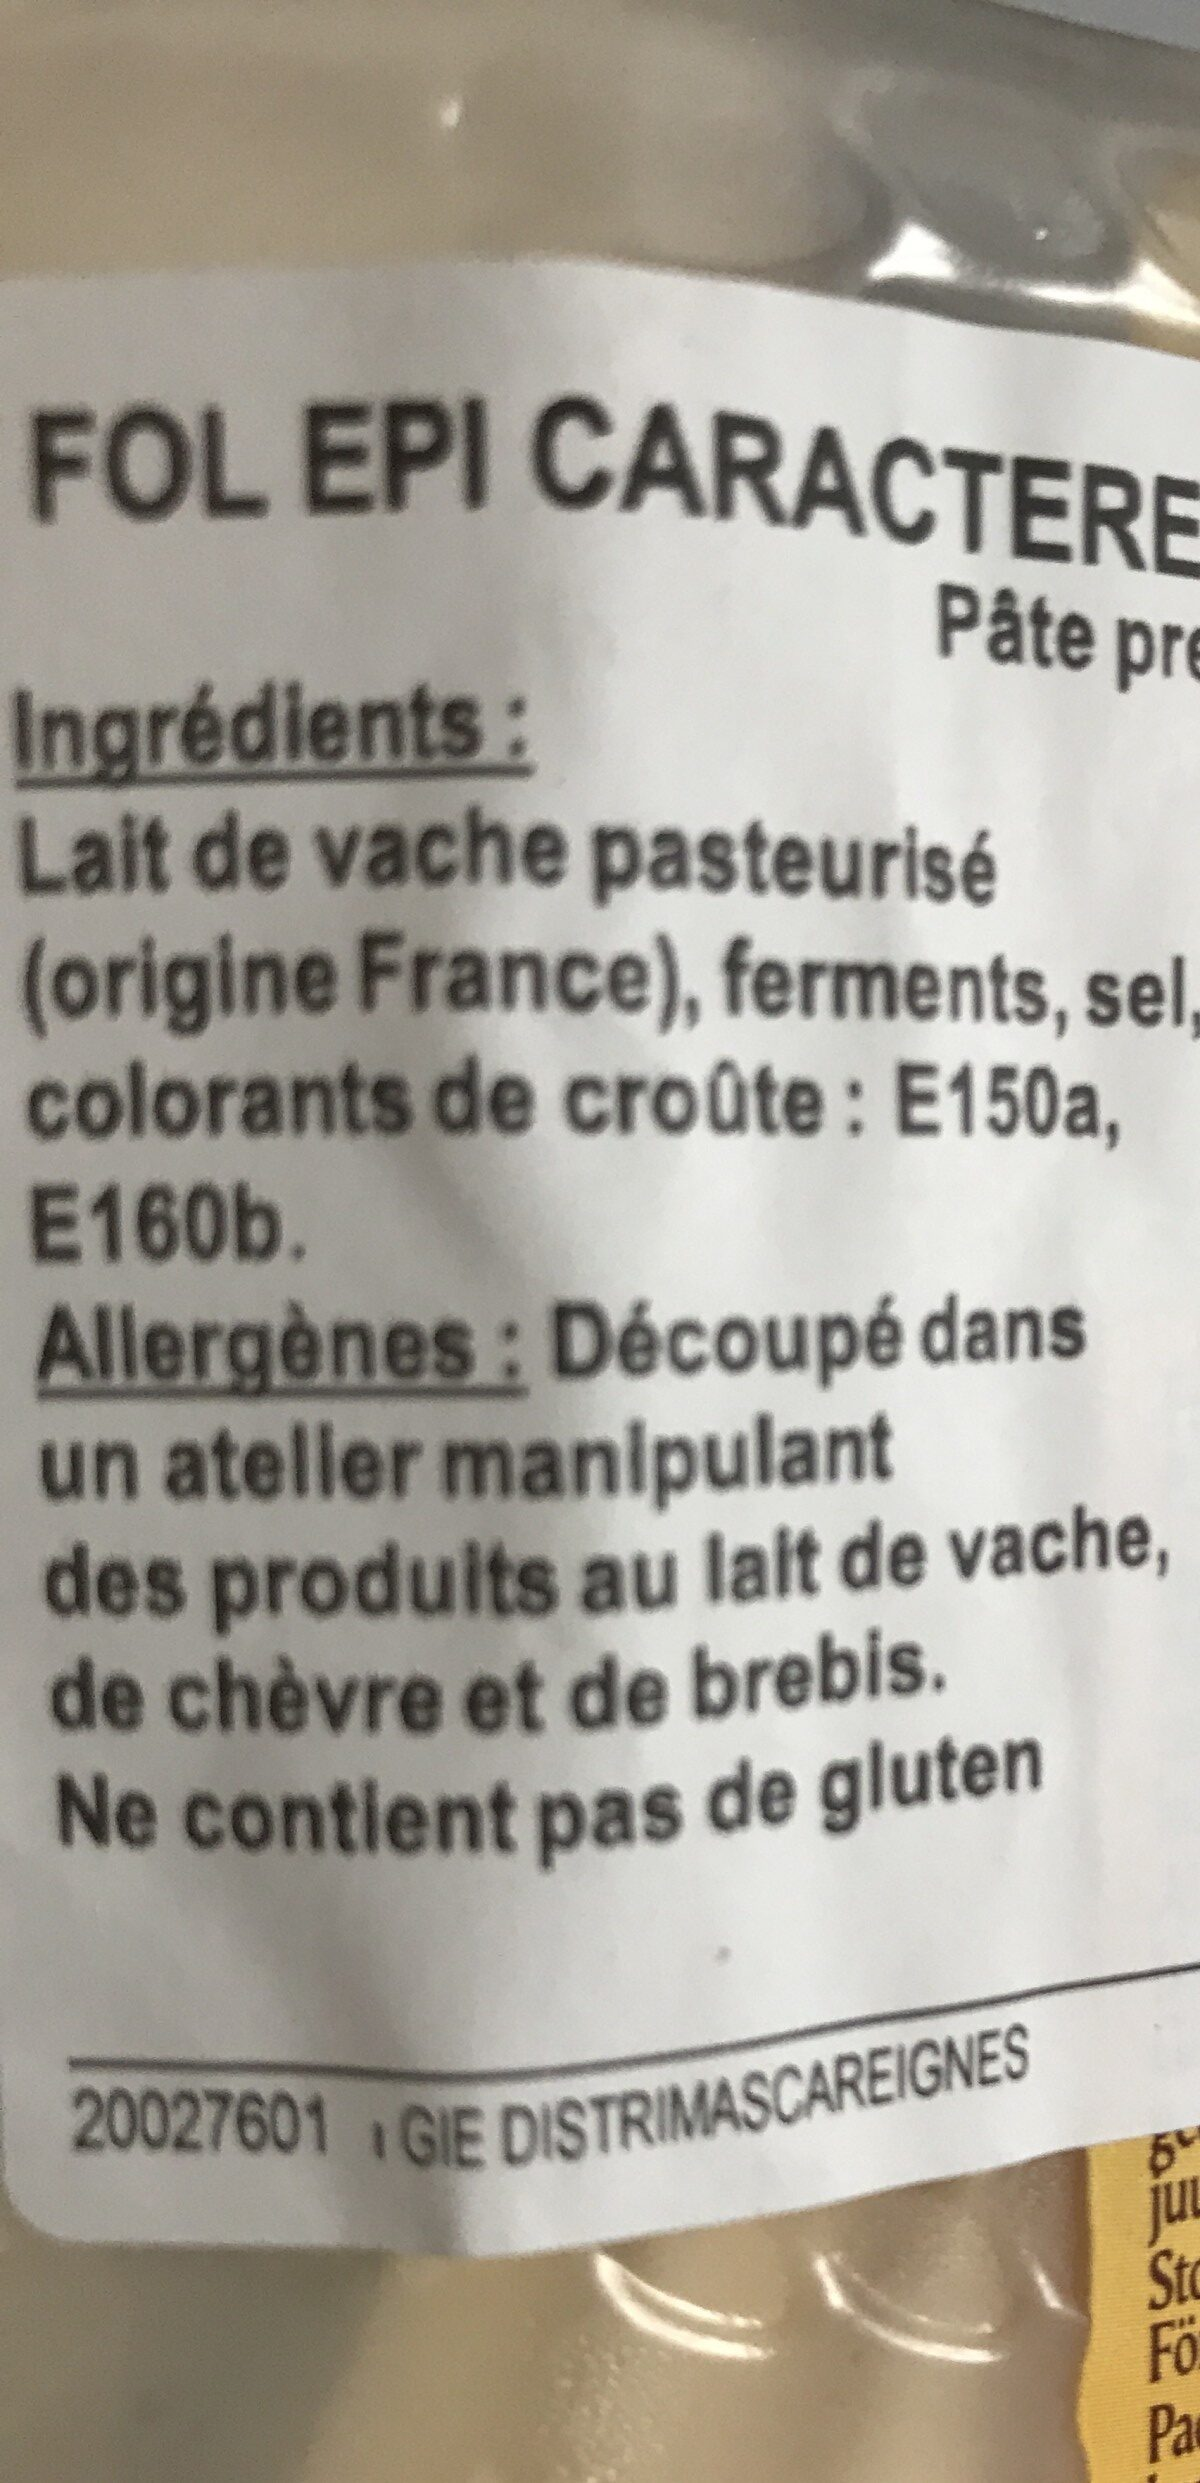 Fol Epi caractere intense & nutty - Ingrédients